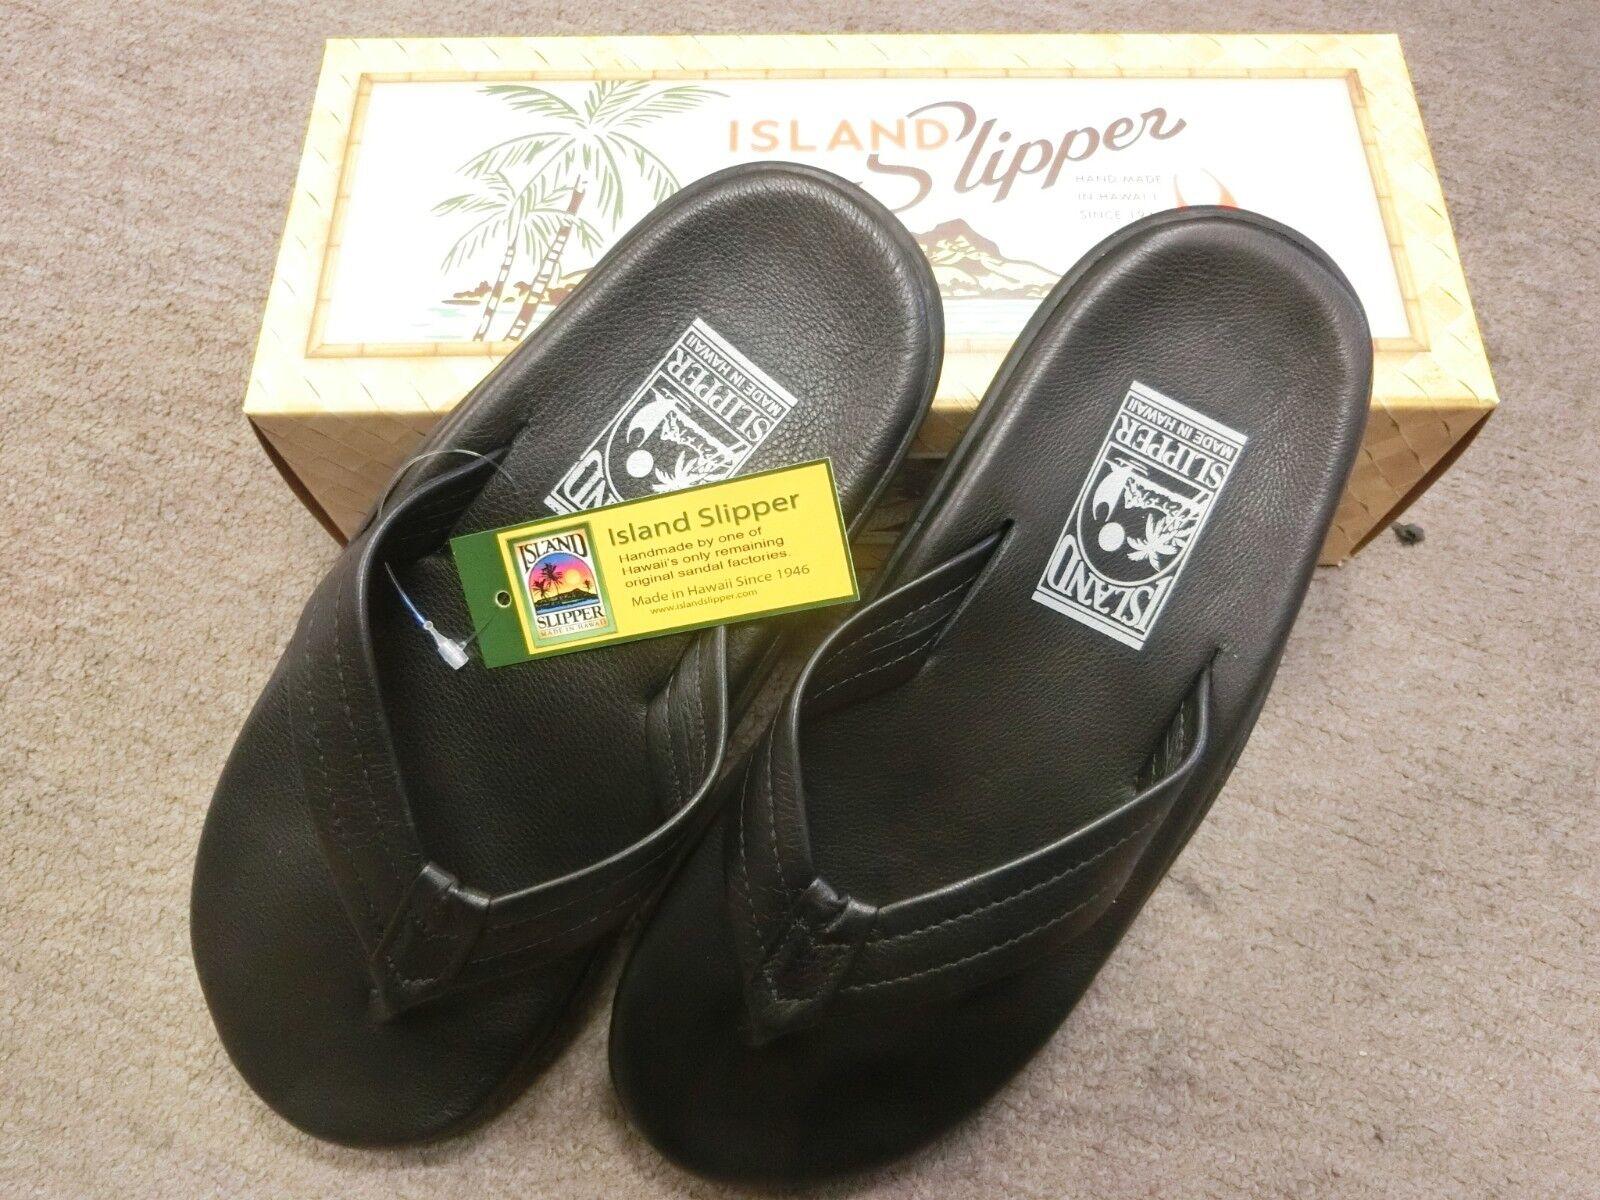 Island Slipper Slipper Slipper Leather Sandal Dimensione 9 nero  PB202 New a33ca9